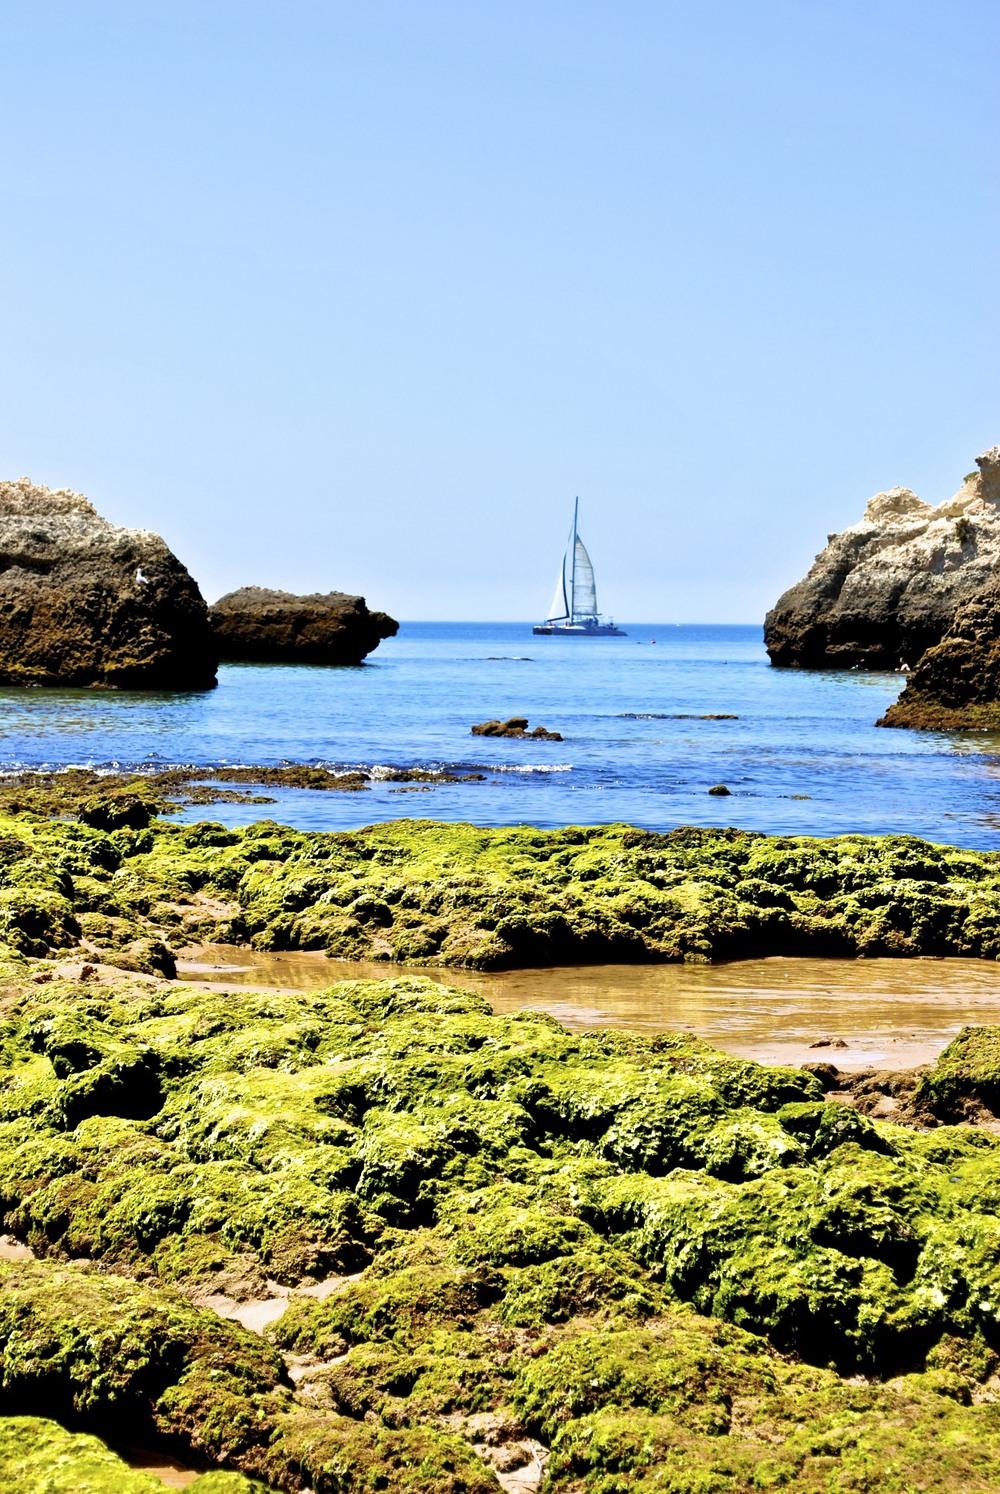 Praia da Rocha, Portugal